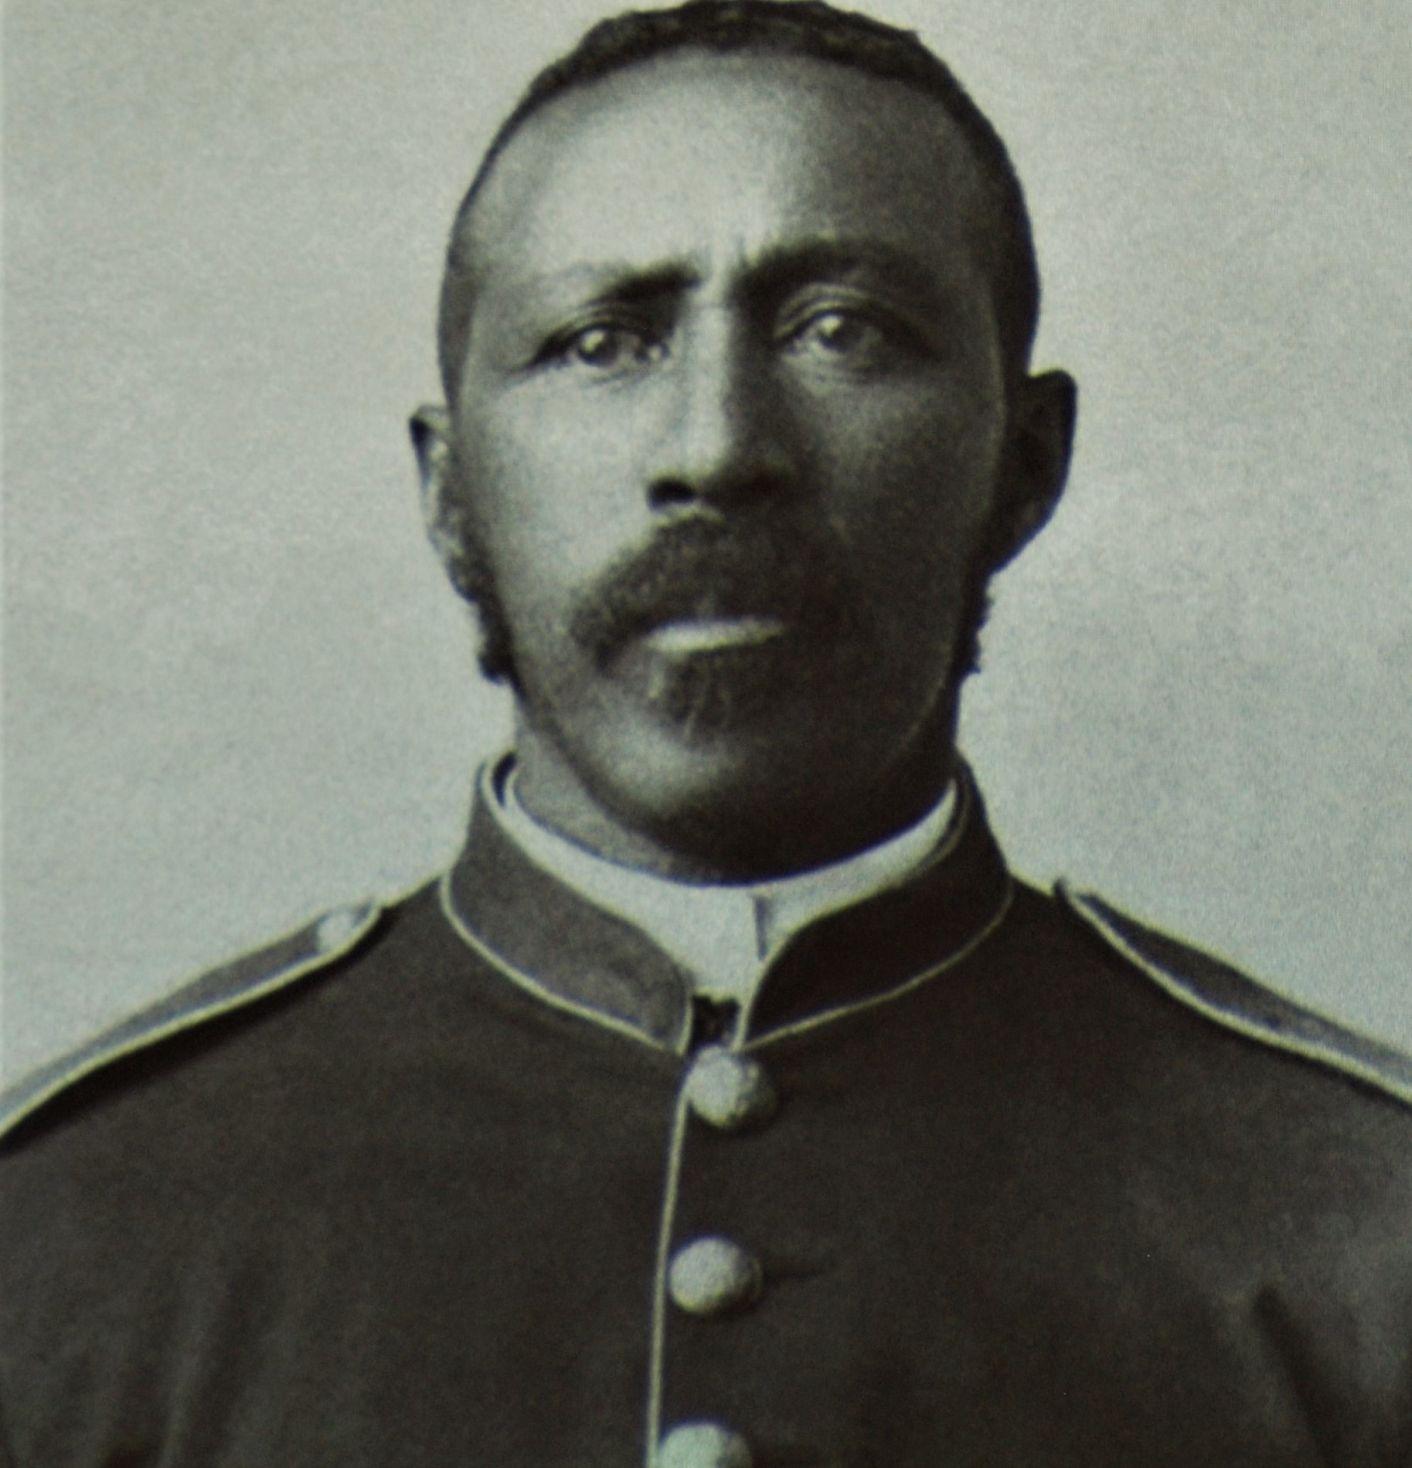 Mose Williams